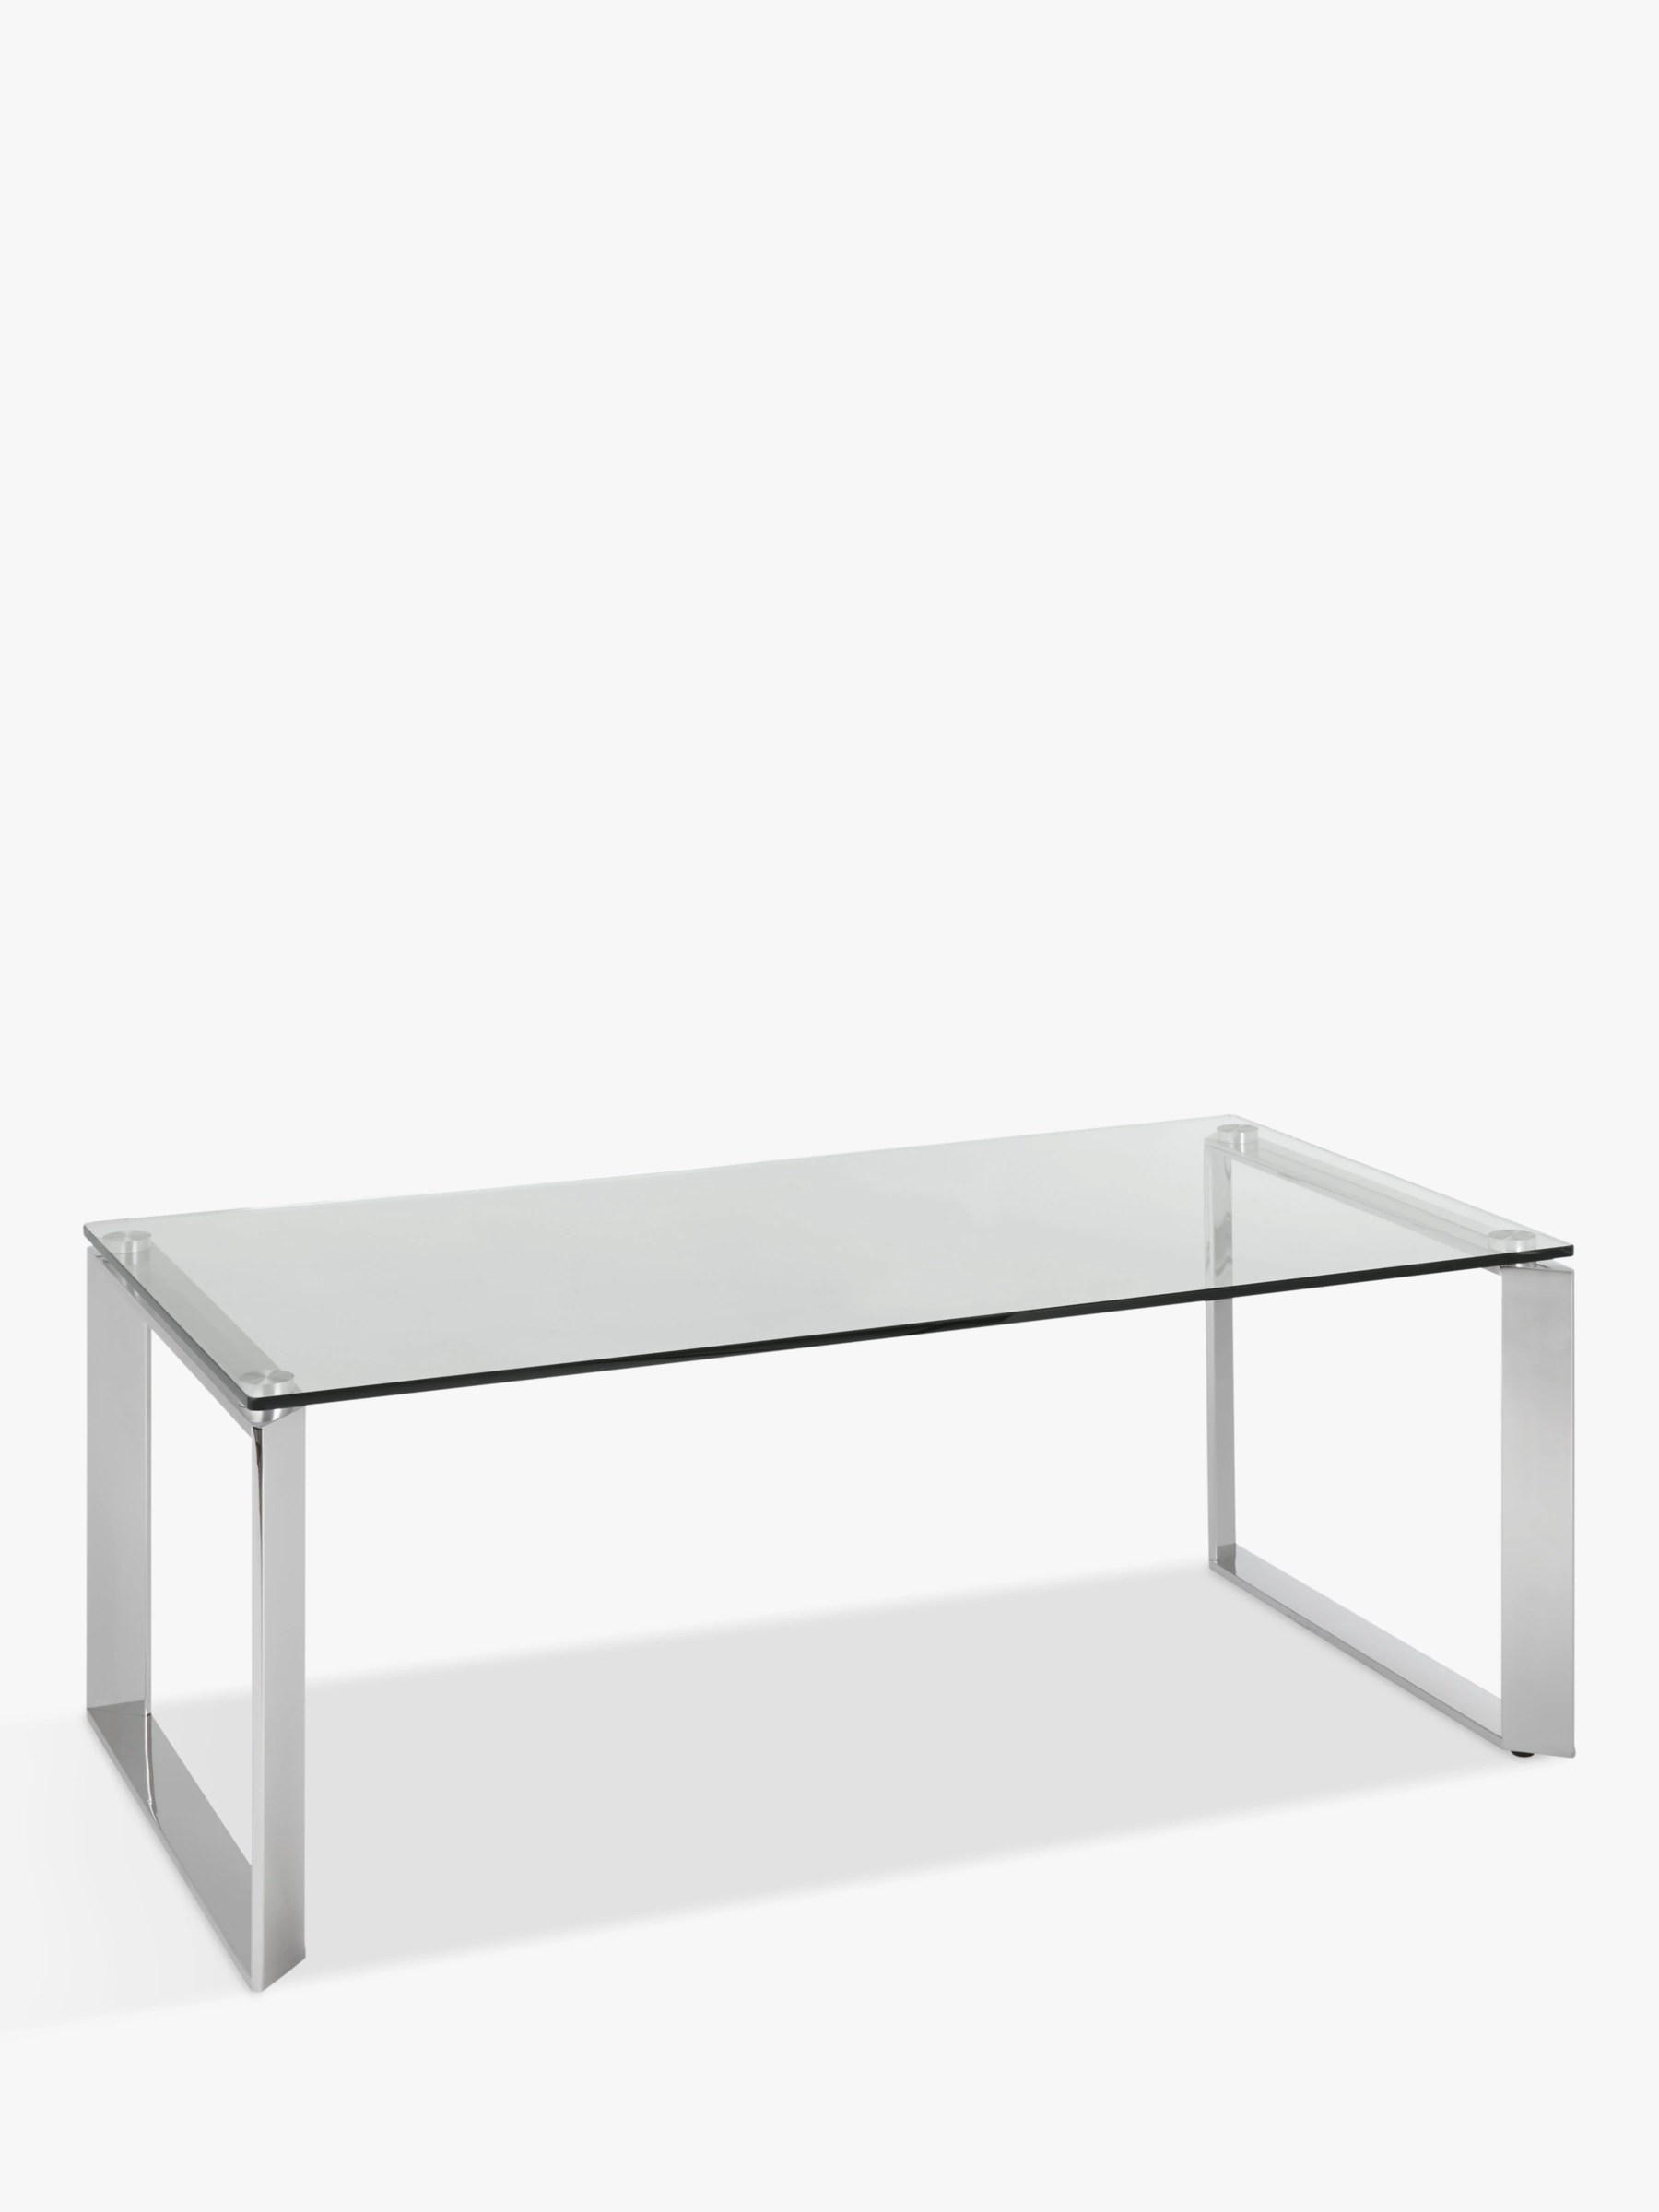 Buy john lewis tropez coffee table online at johnlewis com